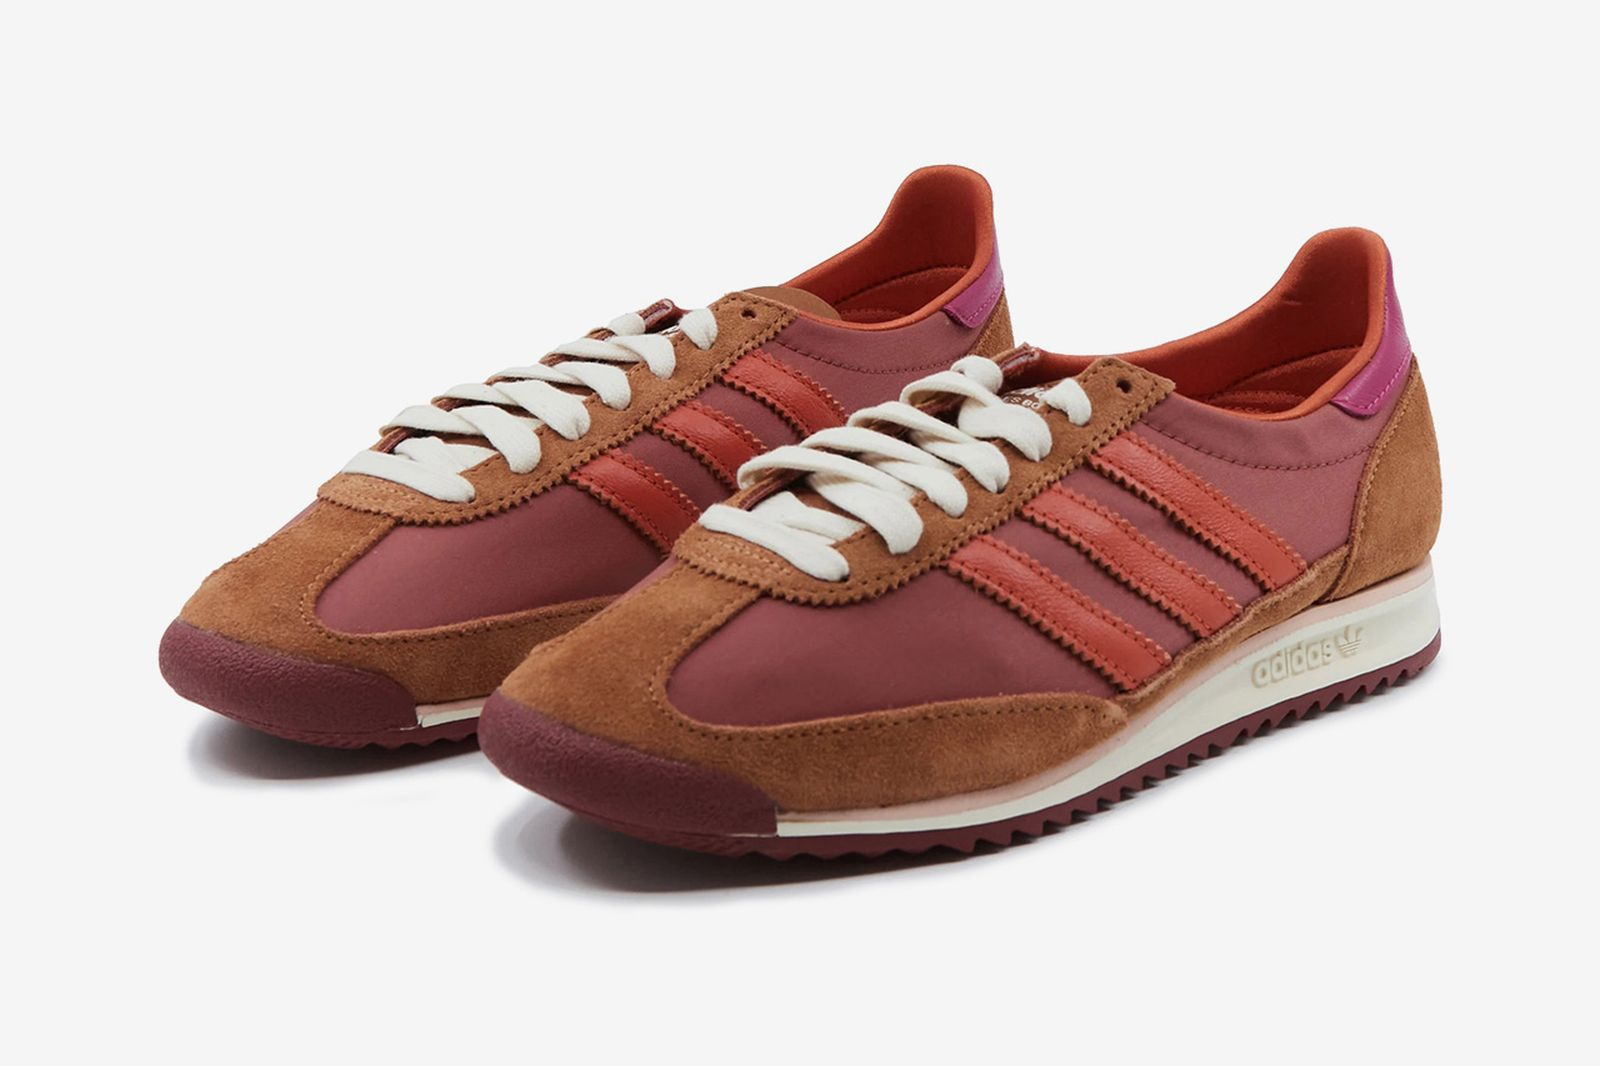 wales-bonner-adidas-originals-samba-release-date-price-04